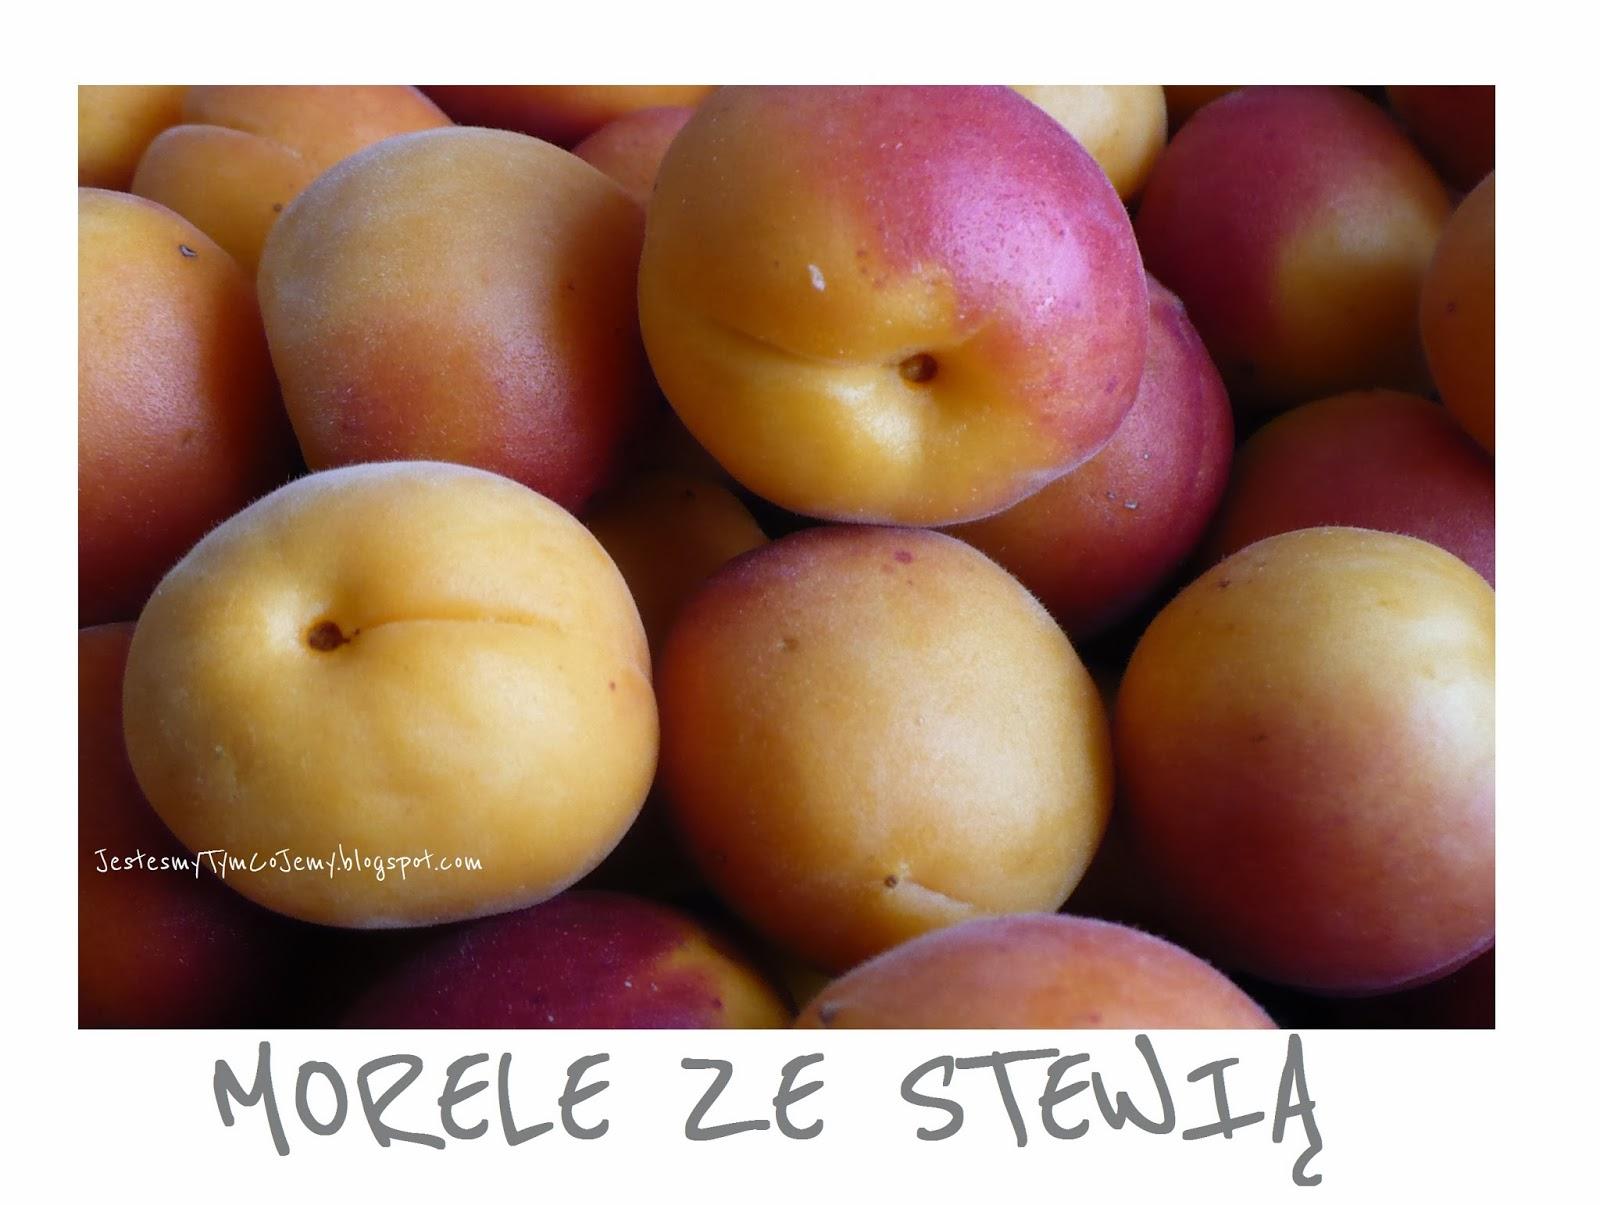 http://jestesmytymcojemy.blogspot.com/2013/08/powida-z-moreli-bez-cukru.html